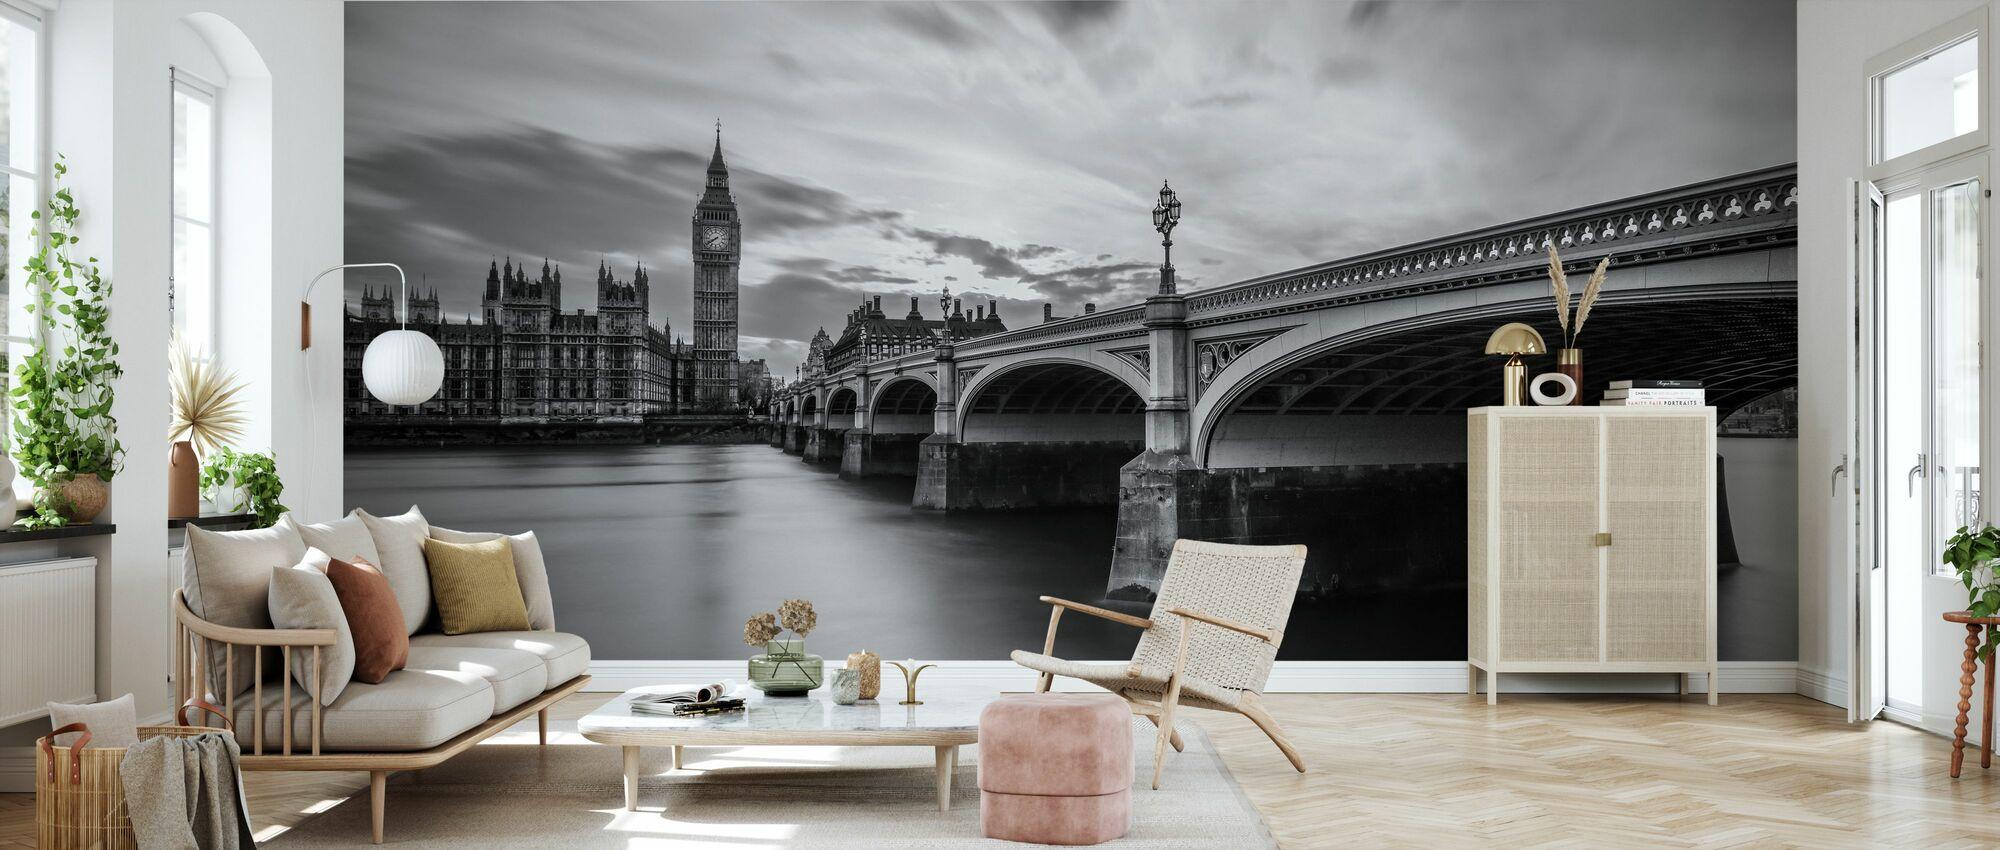 Westminster Serenity - Wallpaper - Living Room